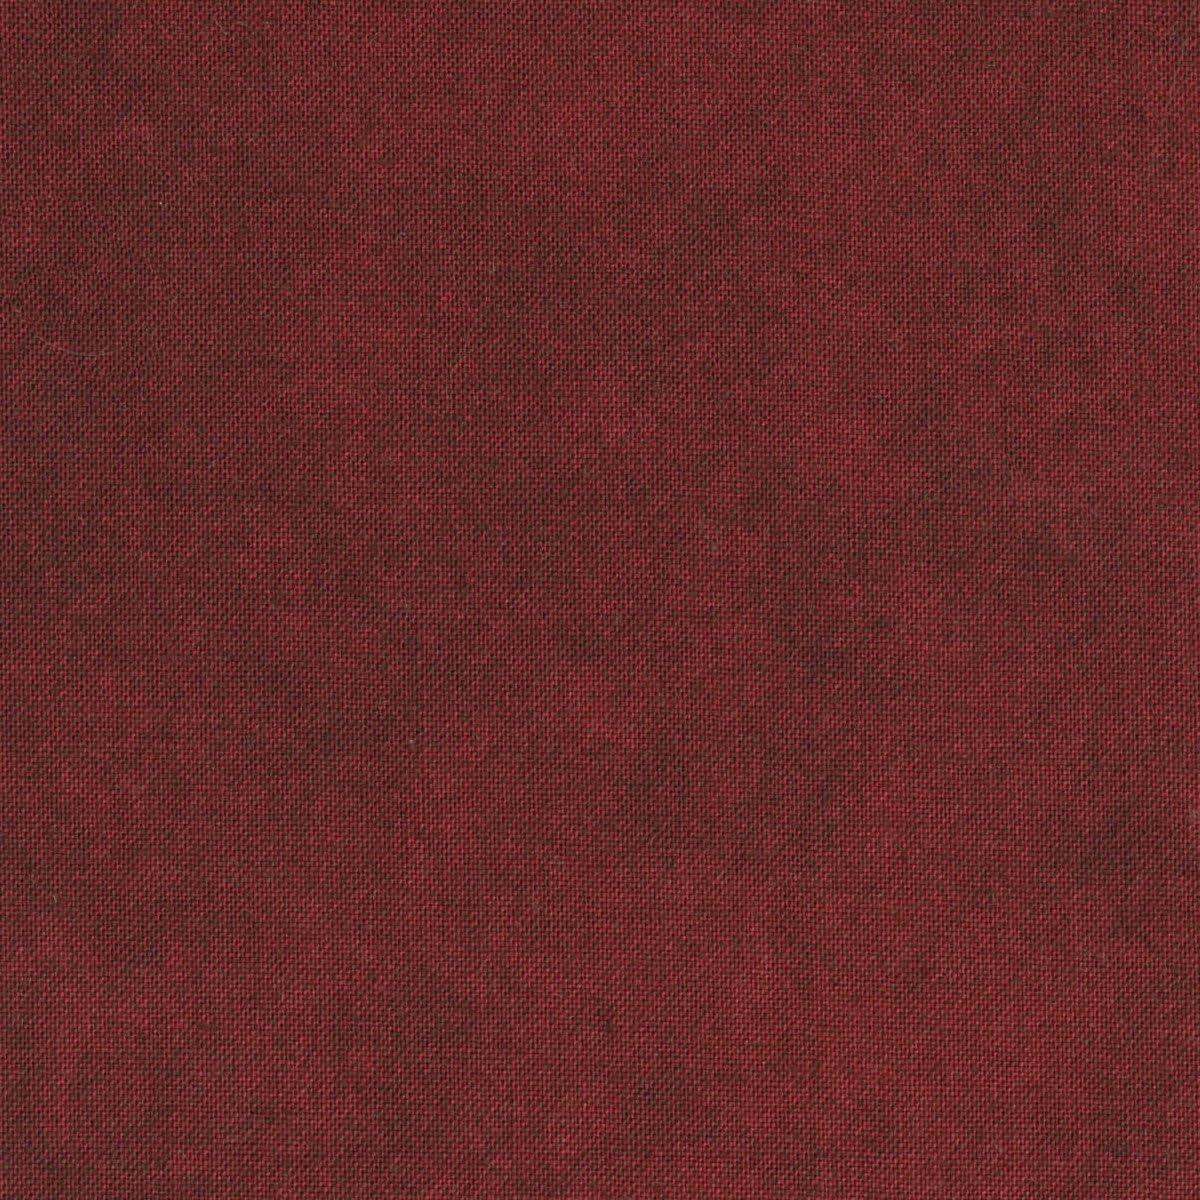 Shadow Play Fabric Rich Dark Burgundy Blender Tonal wholesale 40% OFF Cheap Sale Versatile